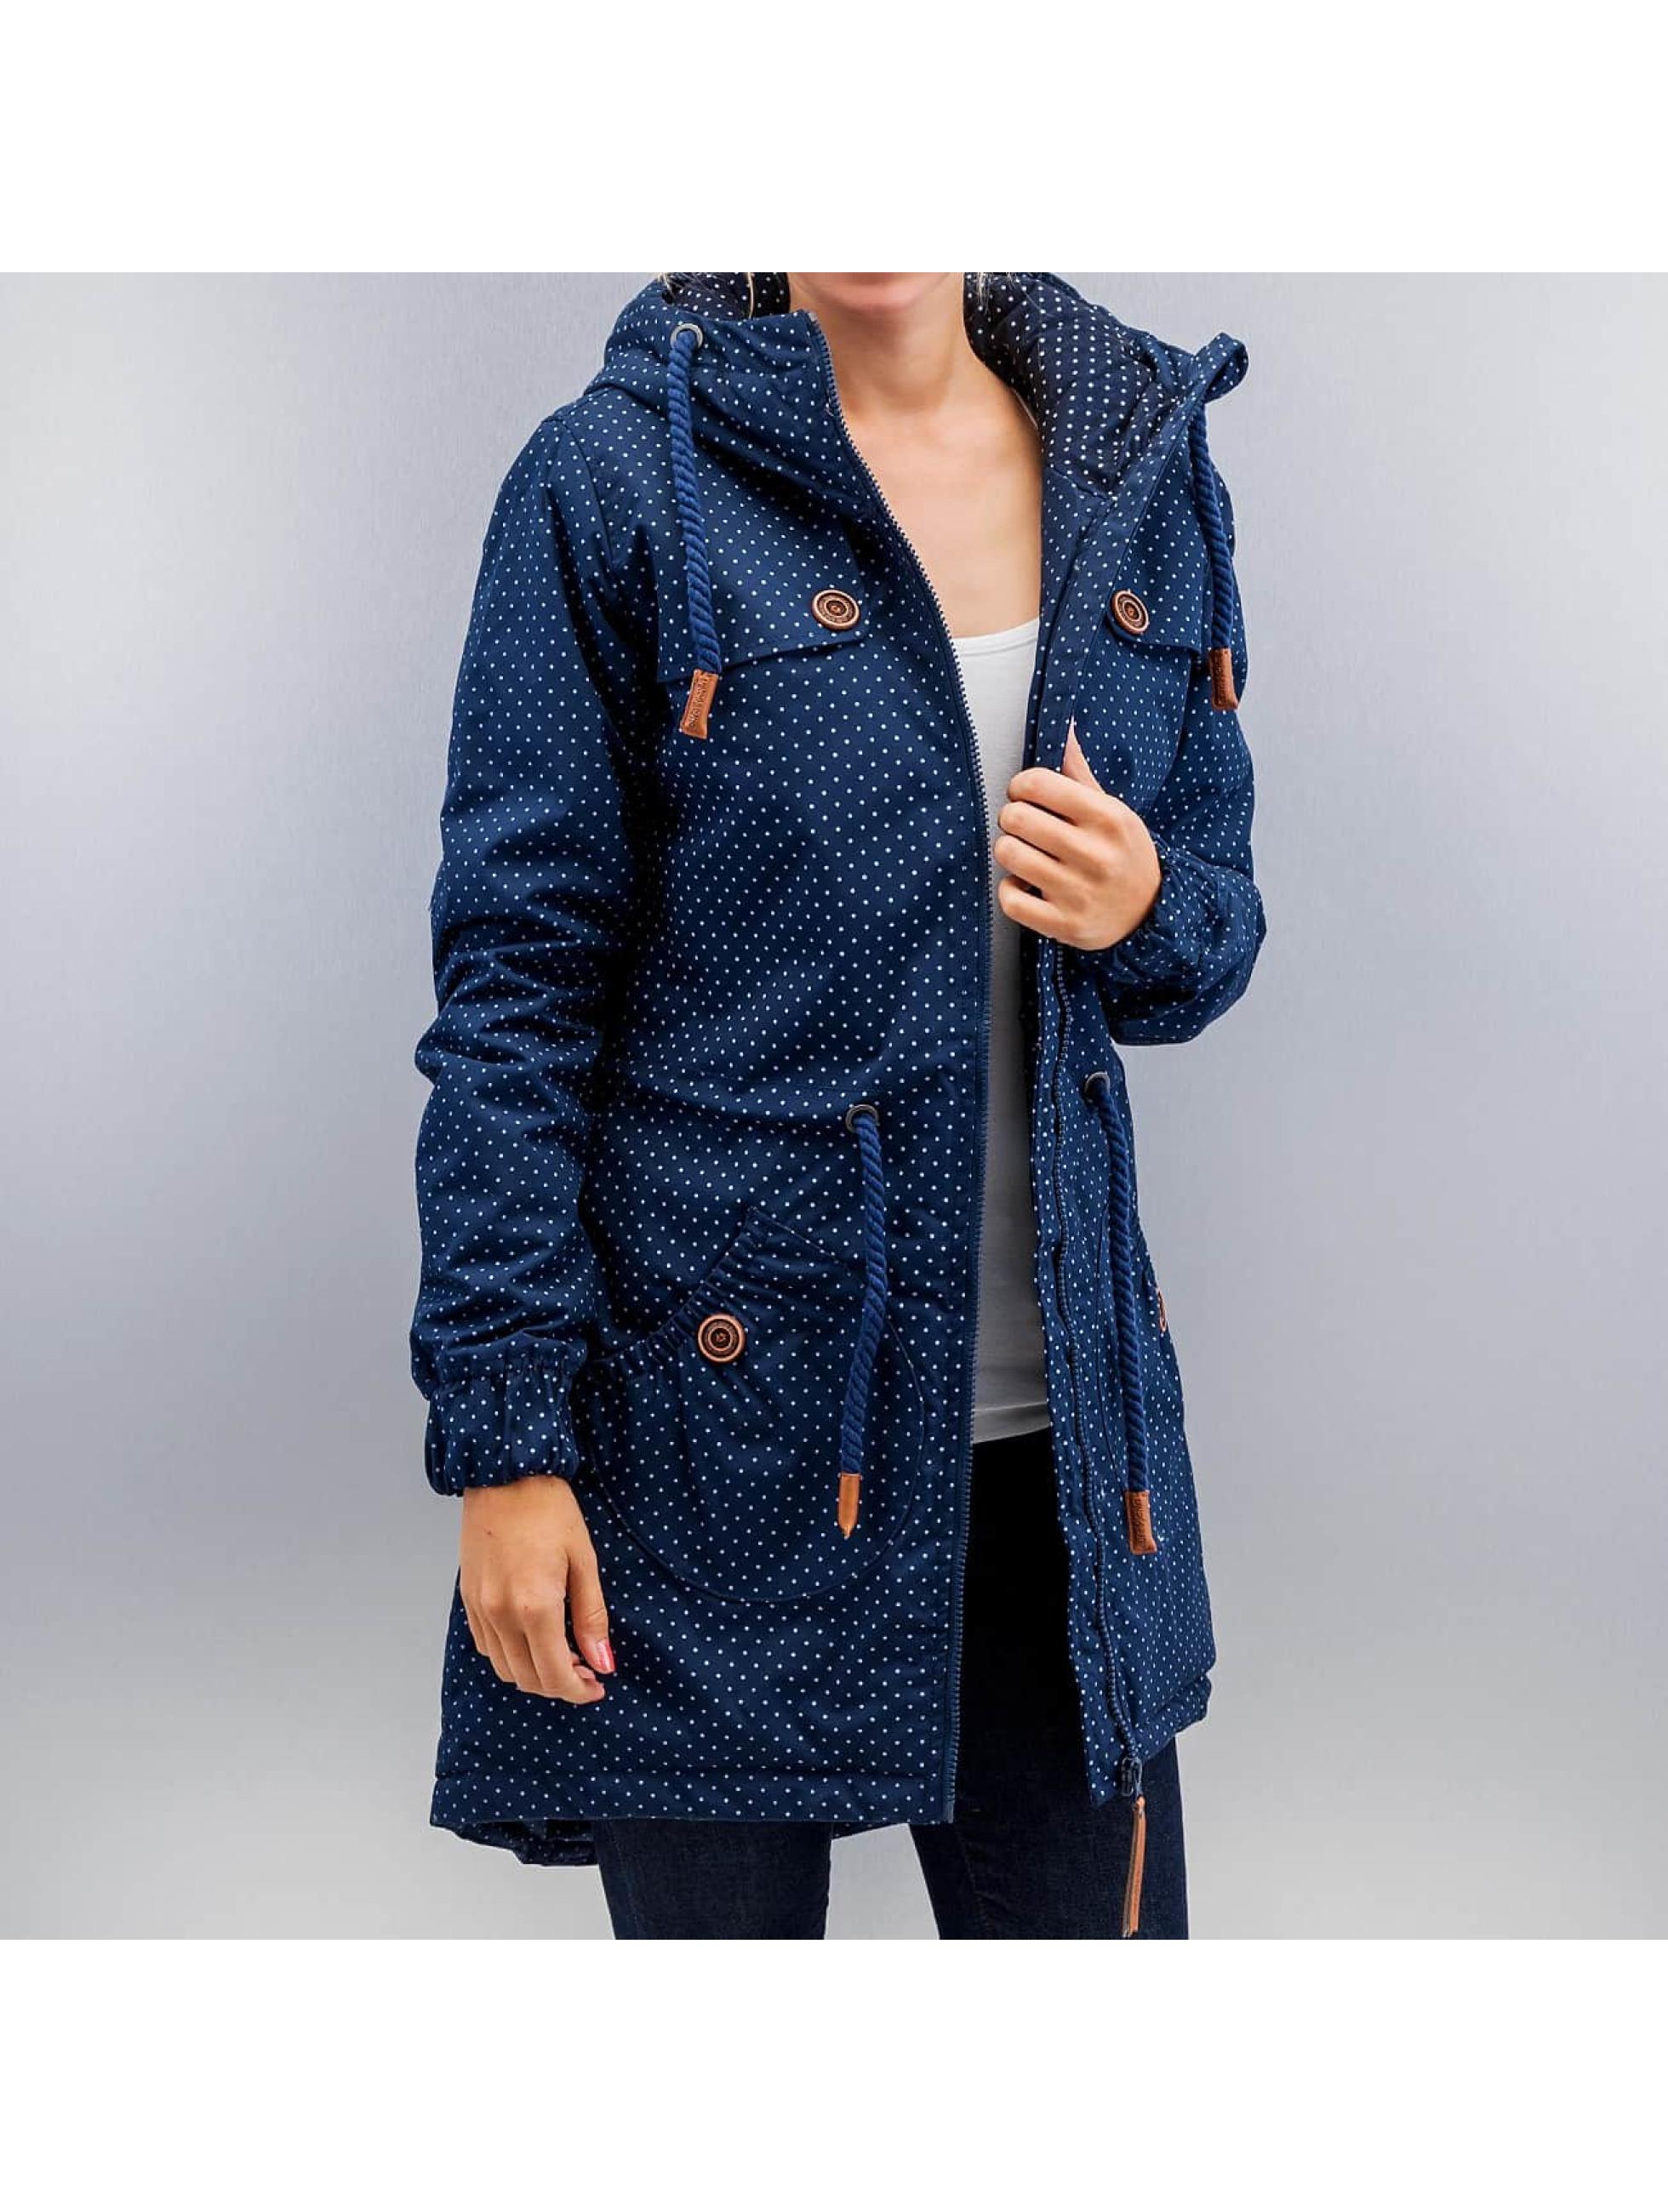 alife kickin veste blouson manteau charlotte a en bleu. Black Bedroom Furniture Sets. Home Design Ideas